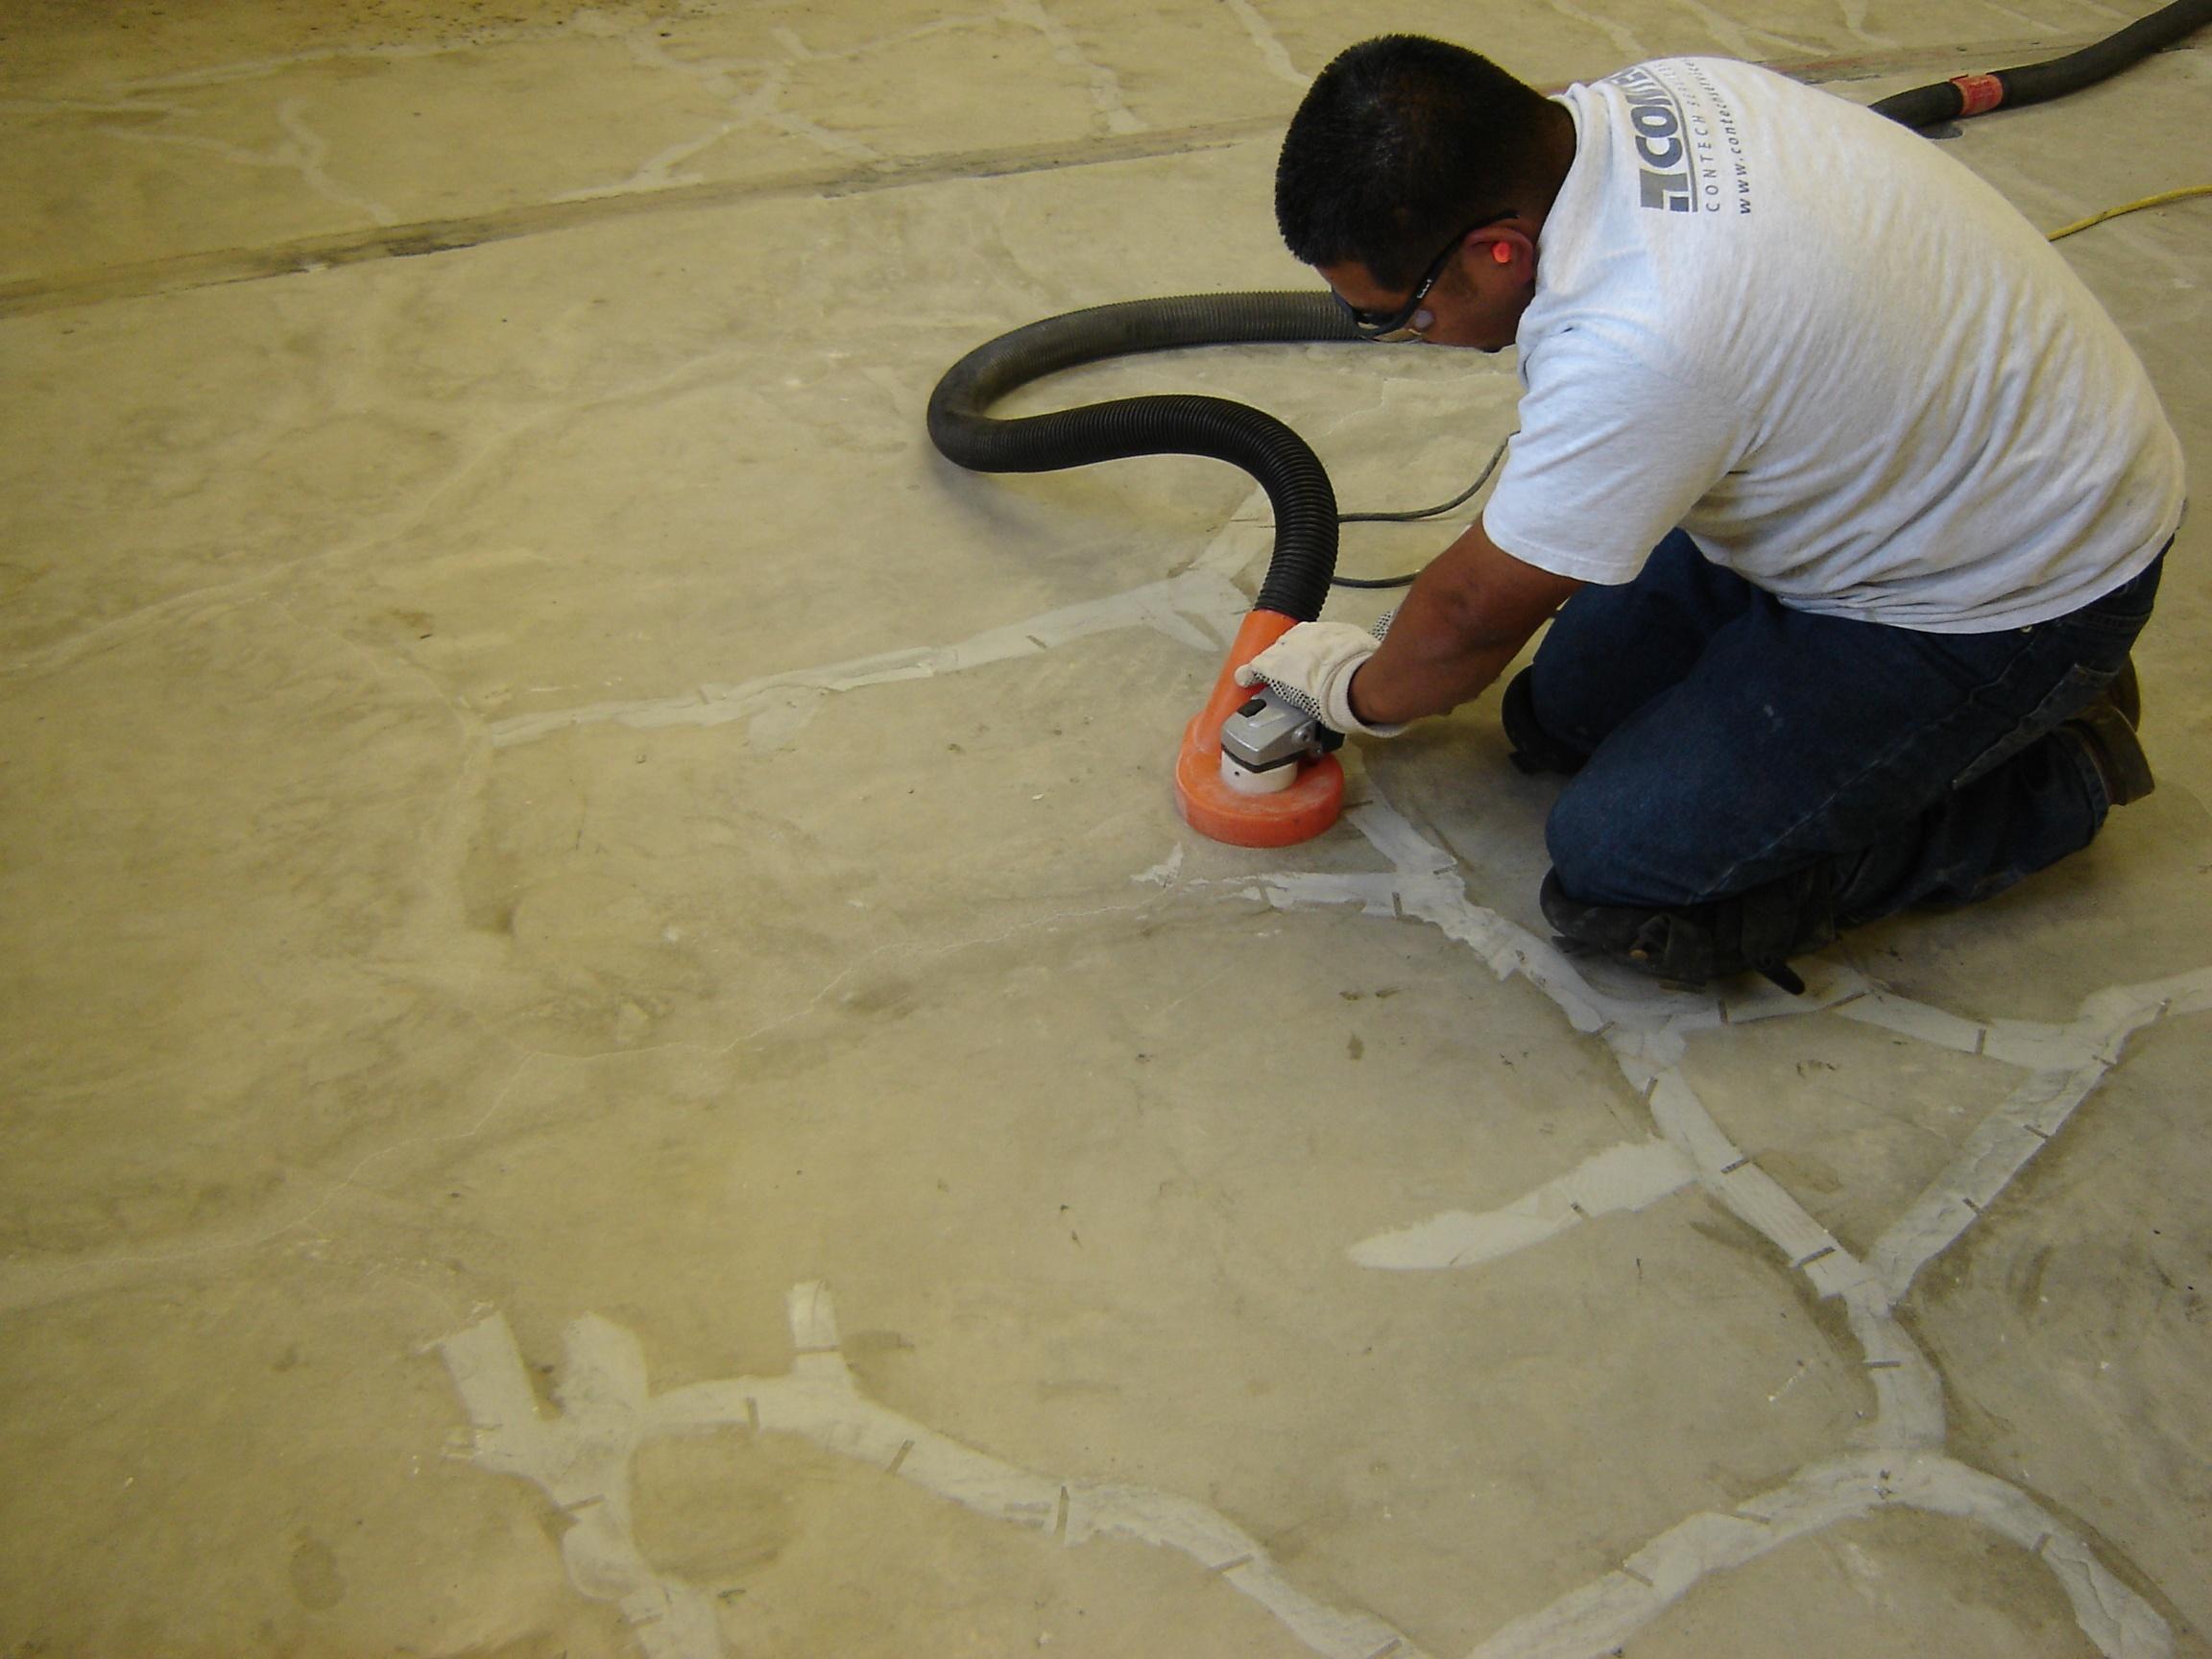 removing surface seal epoxy on an industrial floor repair.jpg